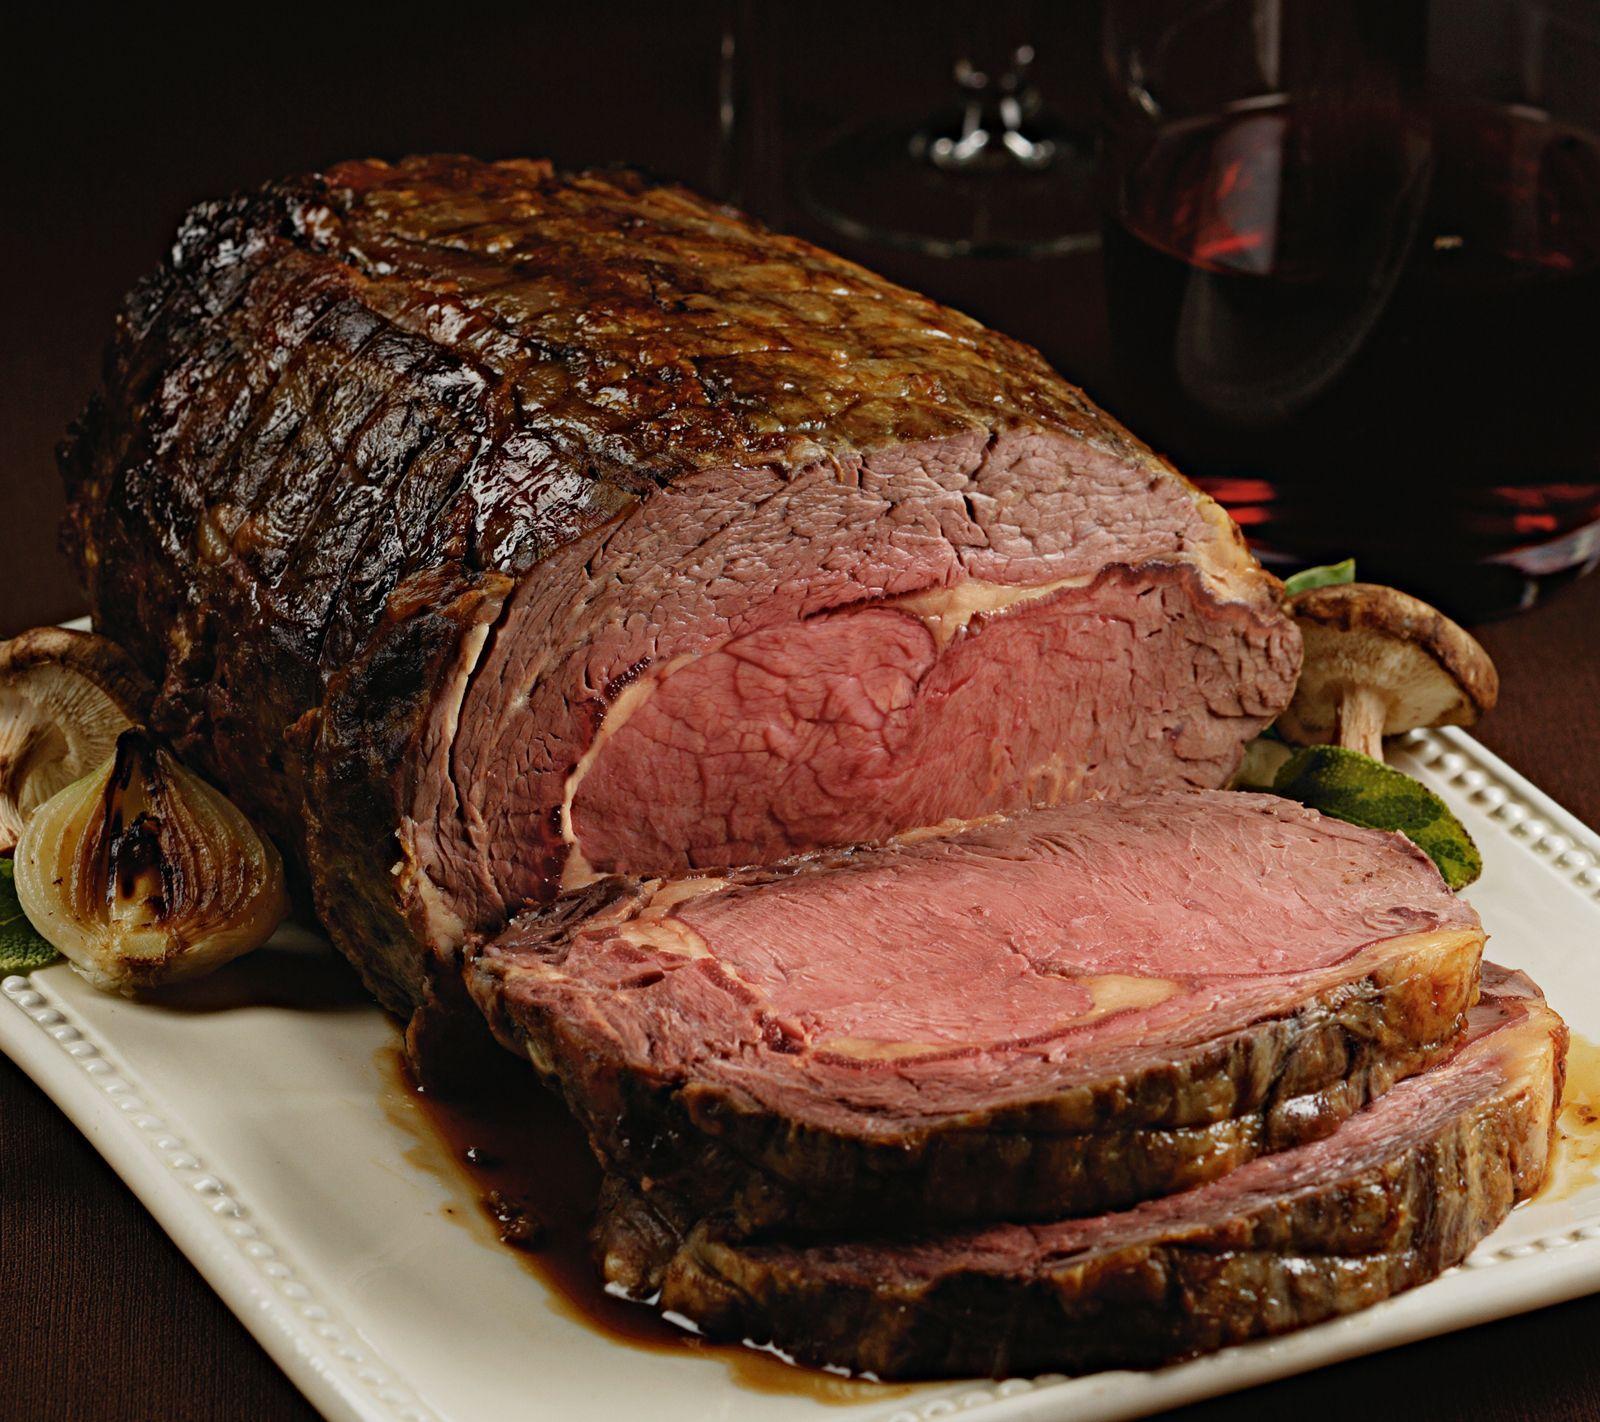 Beautiful Kansas City Steak Company 4 4 5 Lb Garlic Herb Rub Prime Rib M116594 Food From Top Store Prime Rib Roast Cooking Rib Roast Recipe